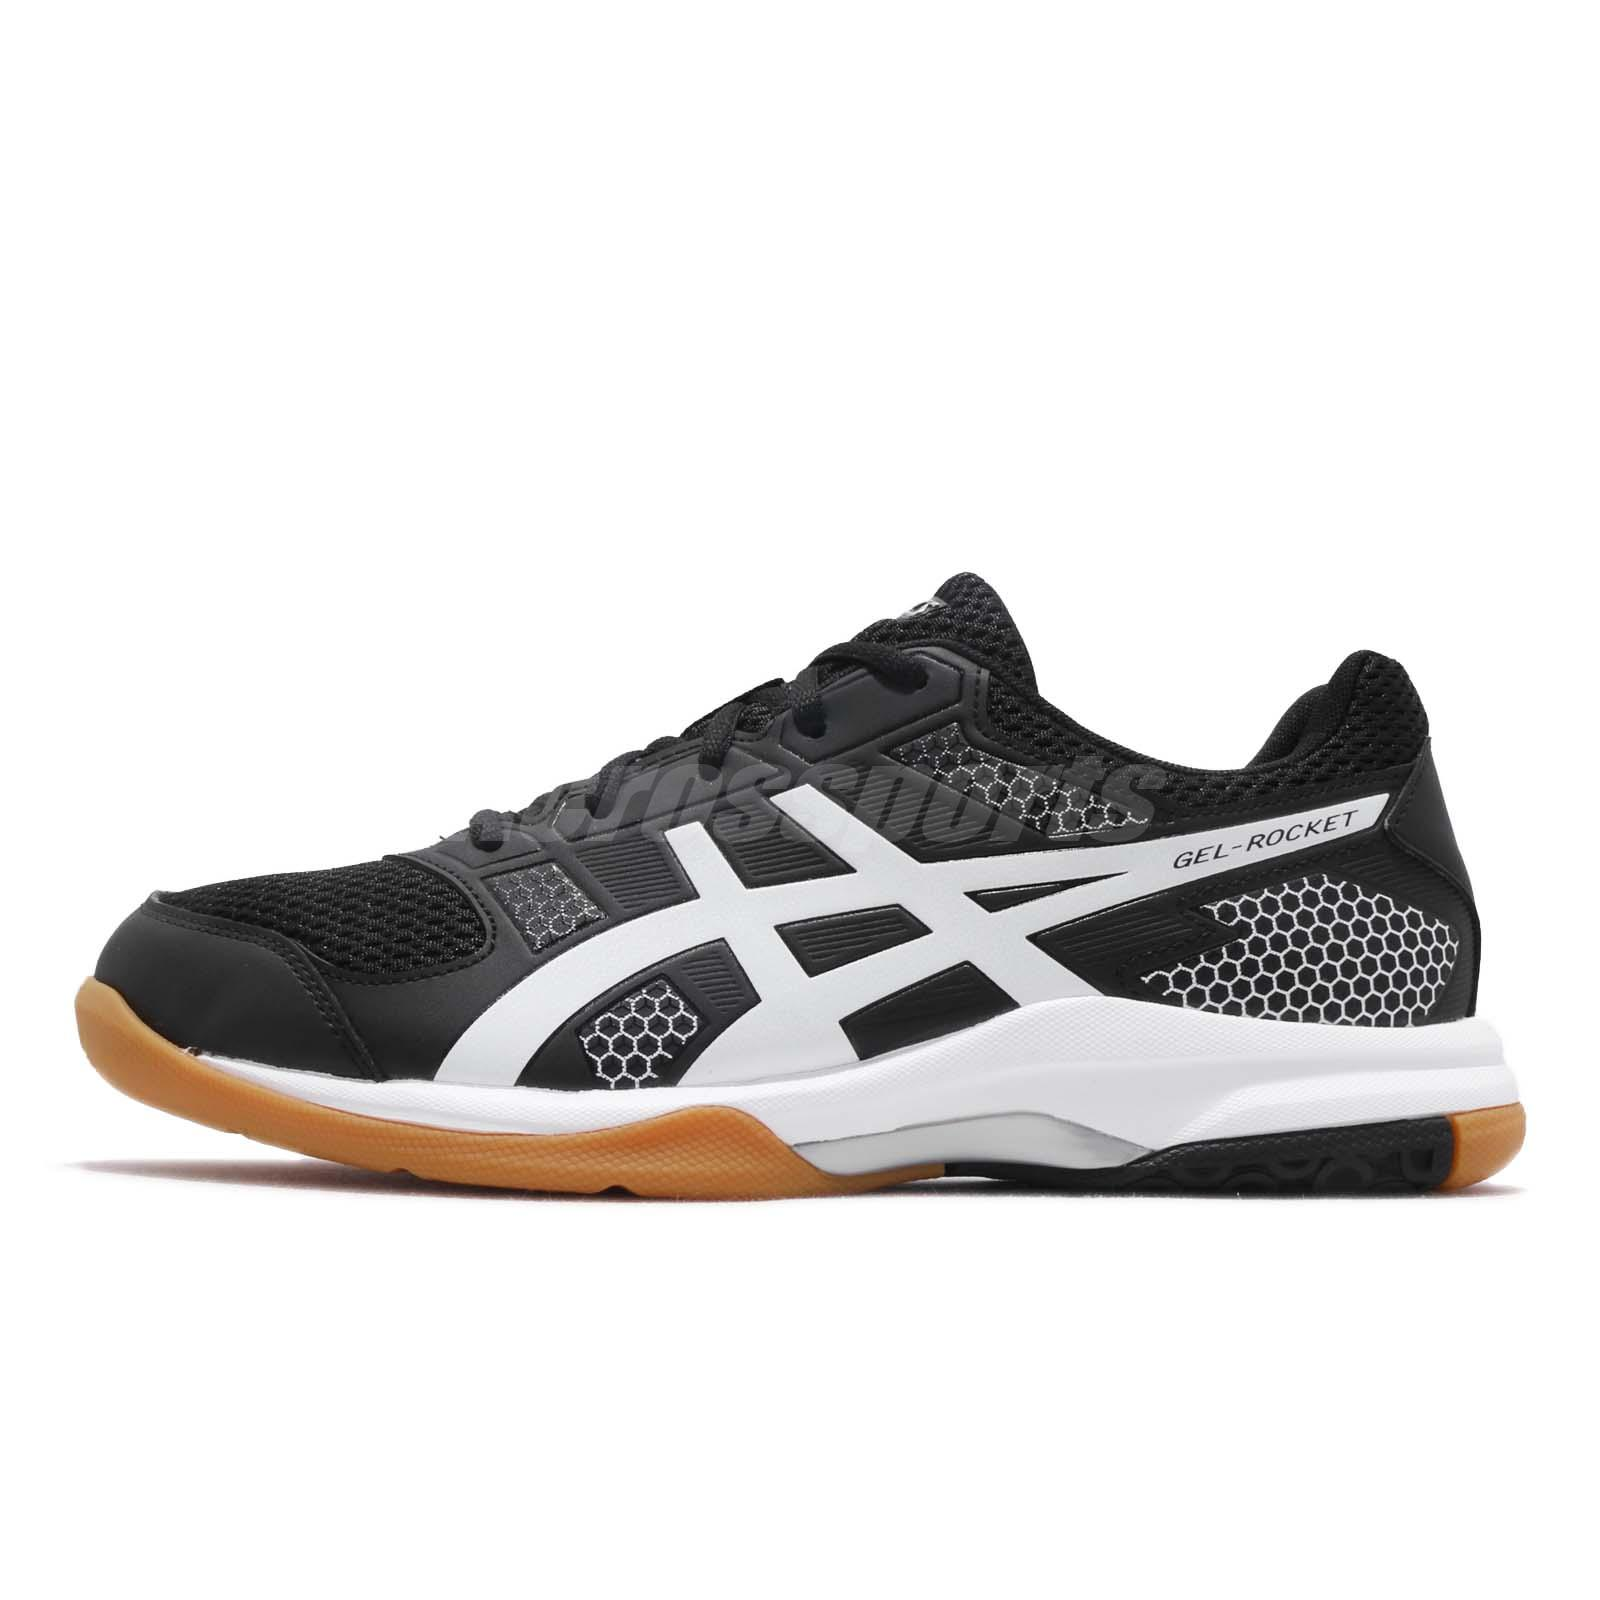 7e85aaf094 Asics Gel-Rocket 8 Black White Gum Men Volleyball Badminton Shoes B706Y-012